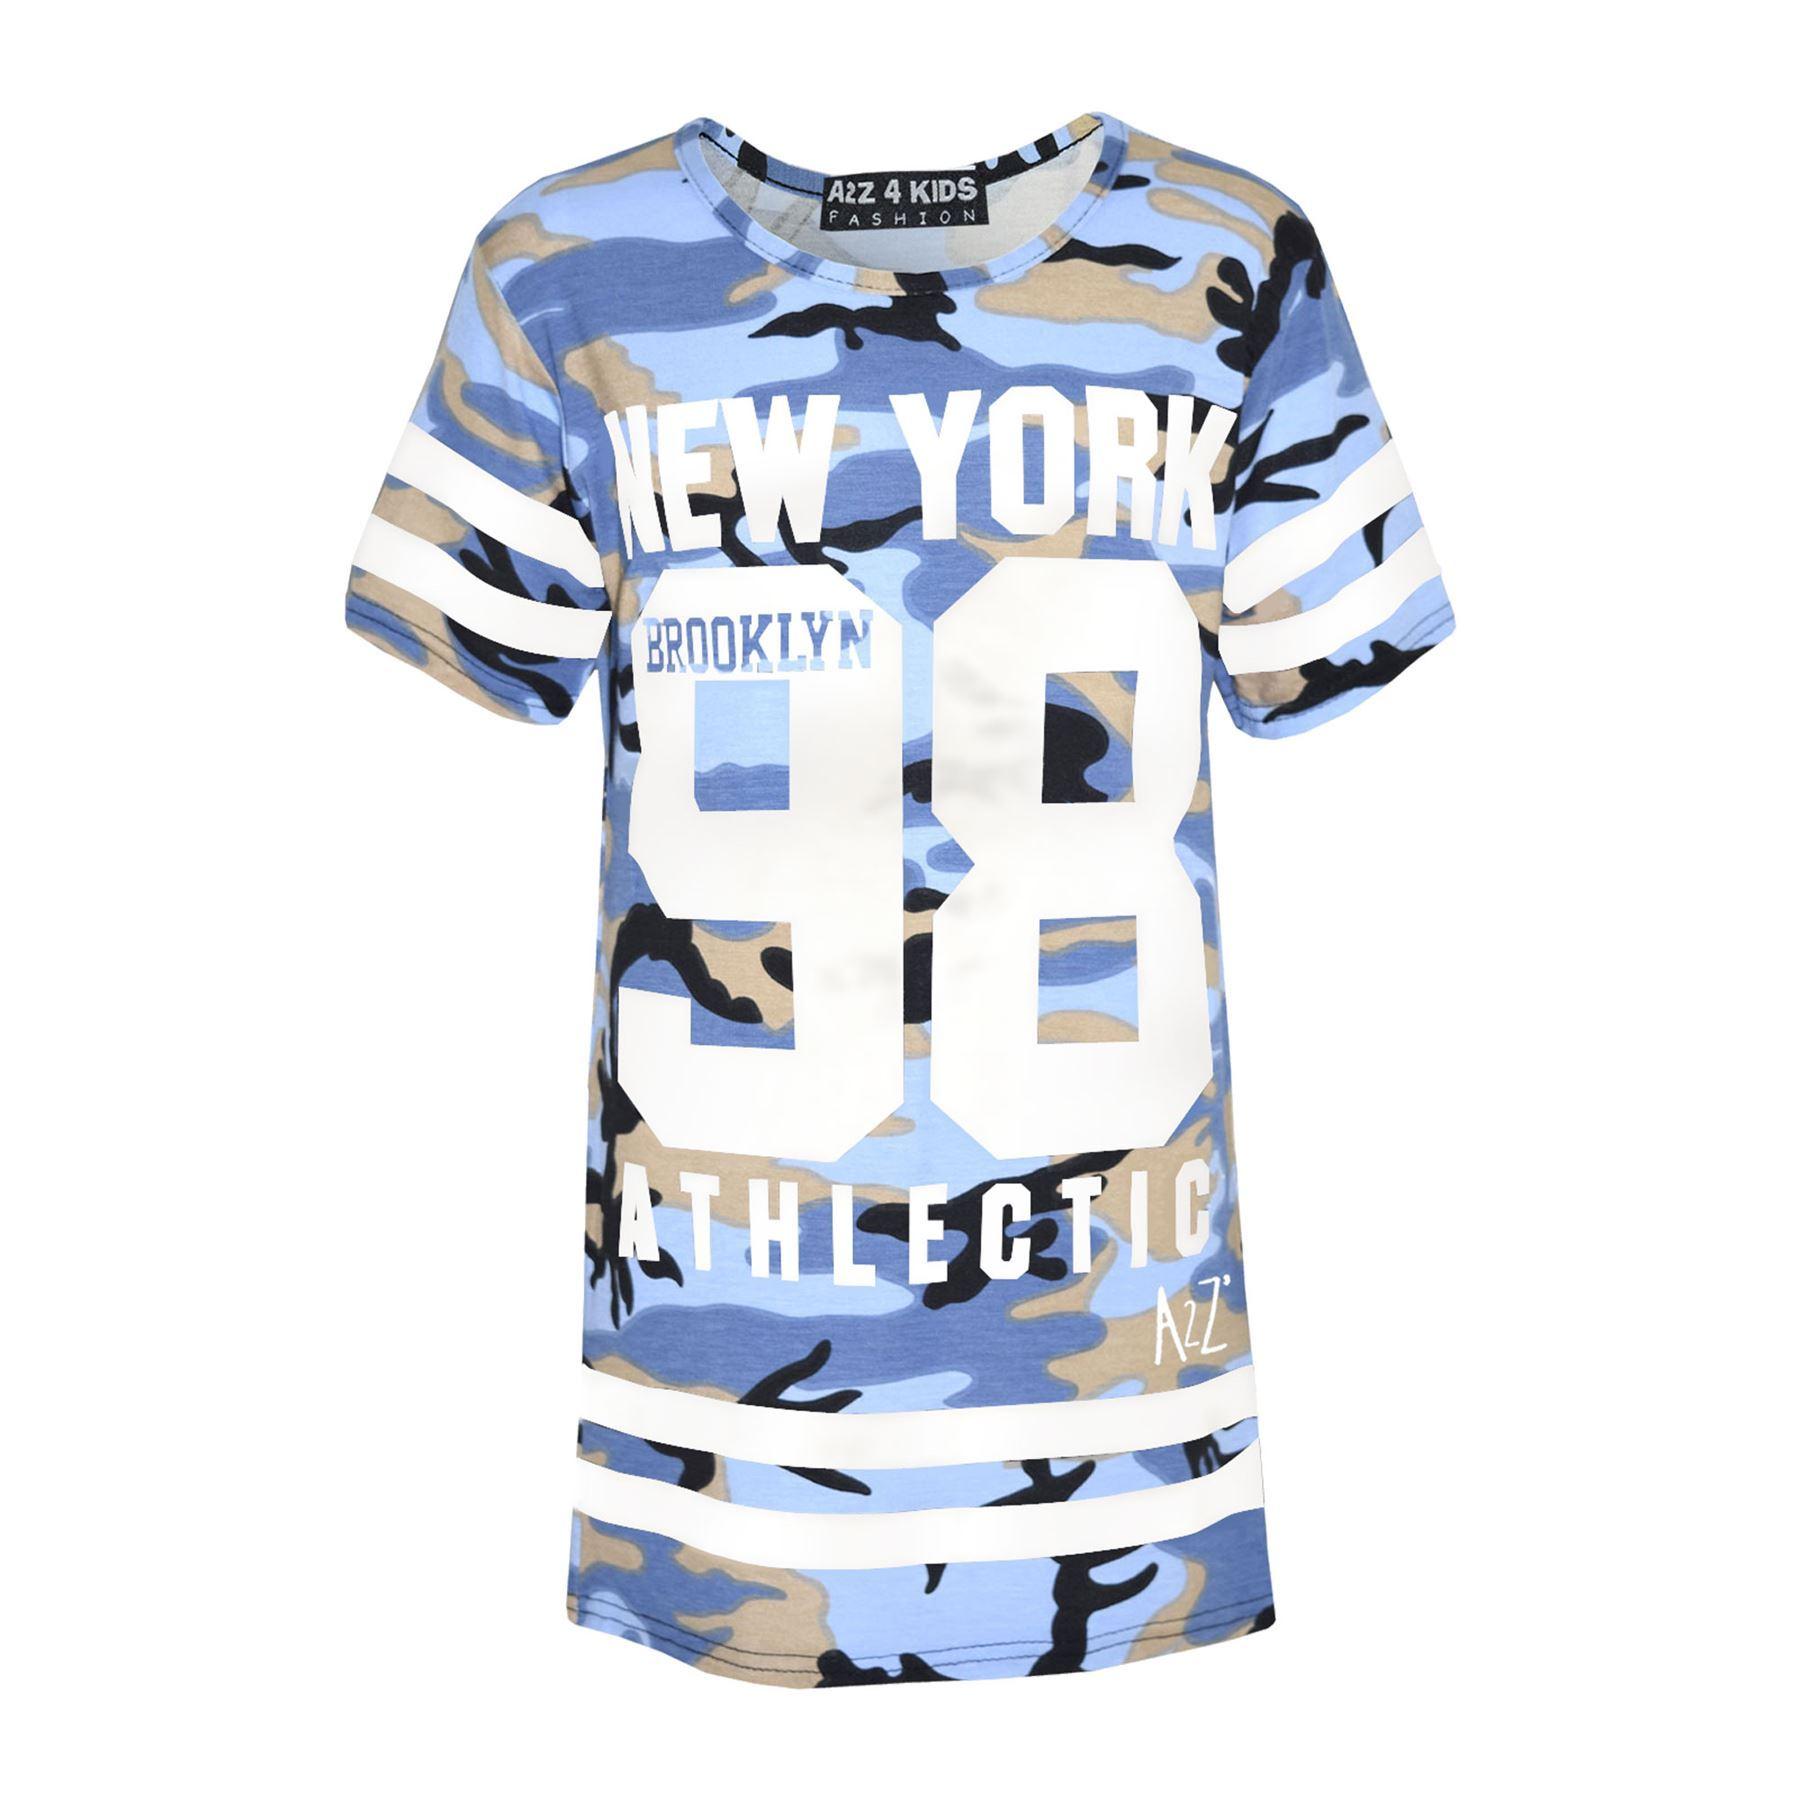 Girls-NEW-YORK-BROOKLYN-98-ATHLECTIC-Camouflage-Print-Top-amp-Legging-Set-7-13-Yr thumbnail 14